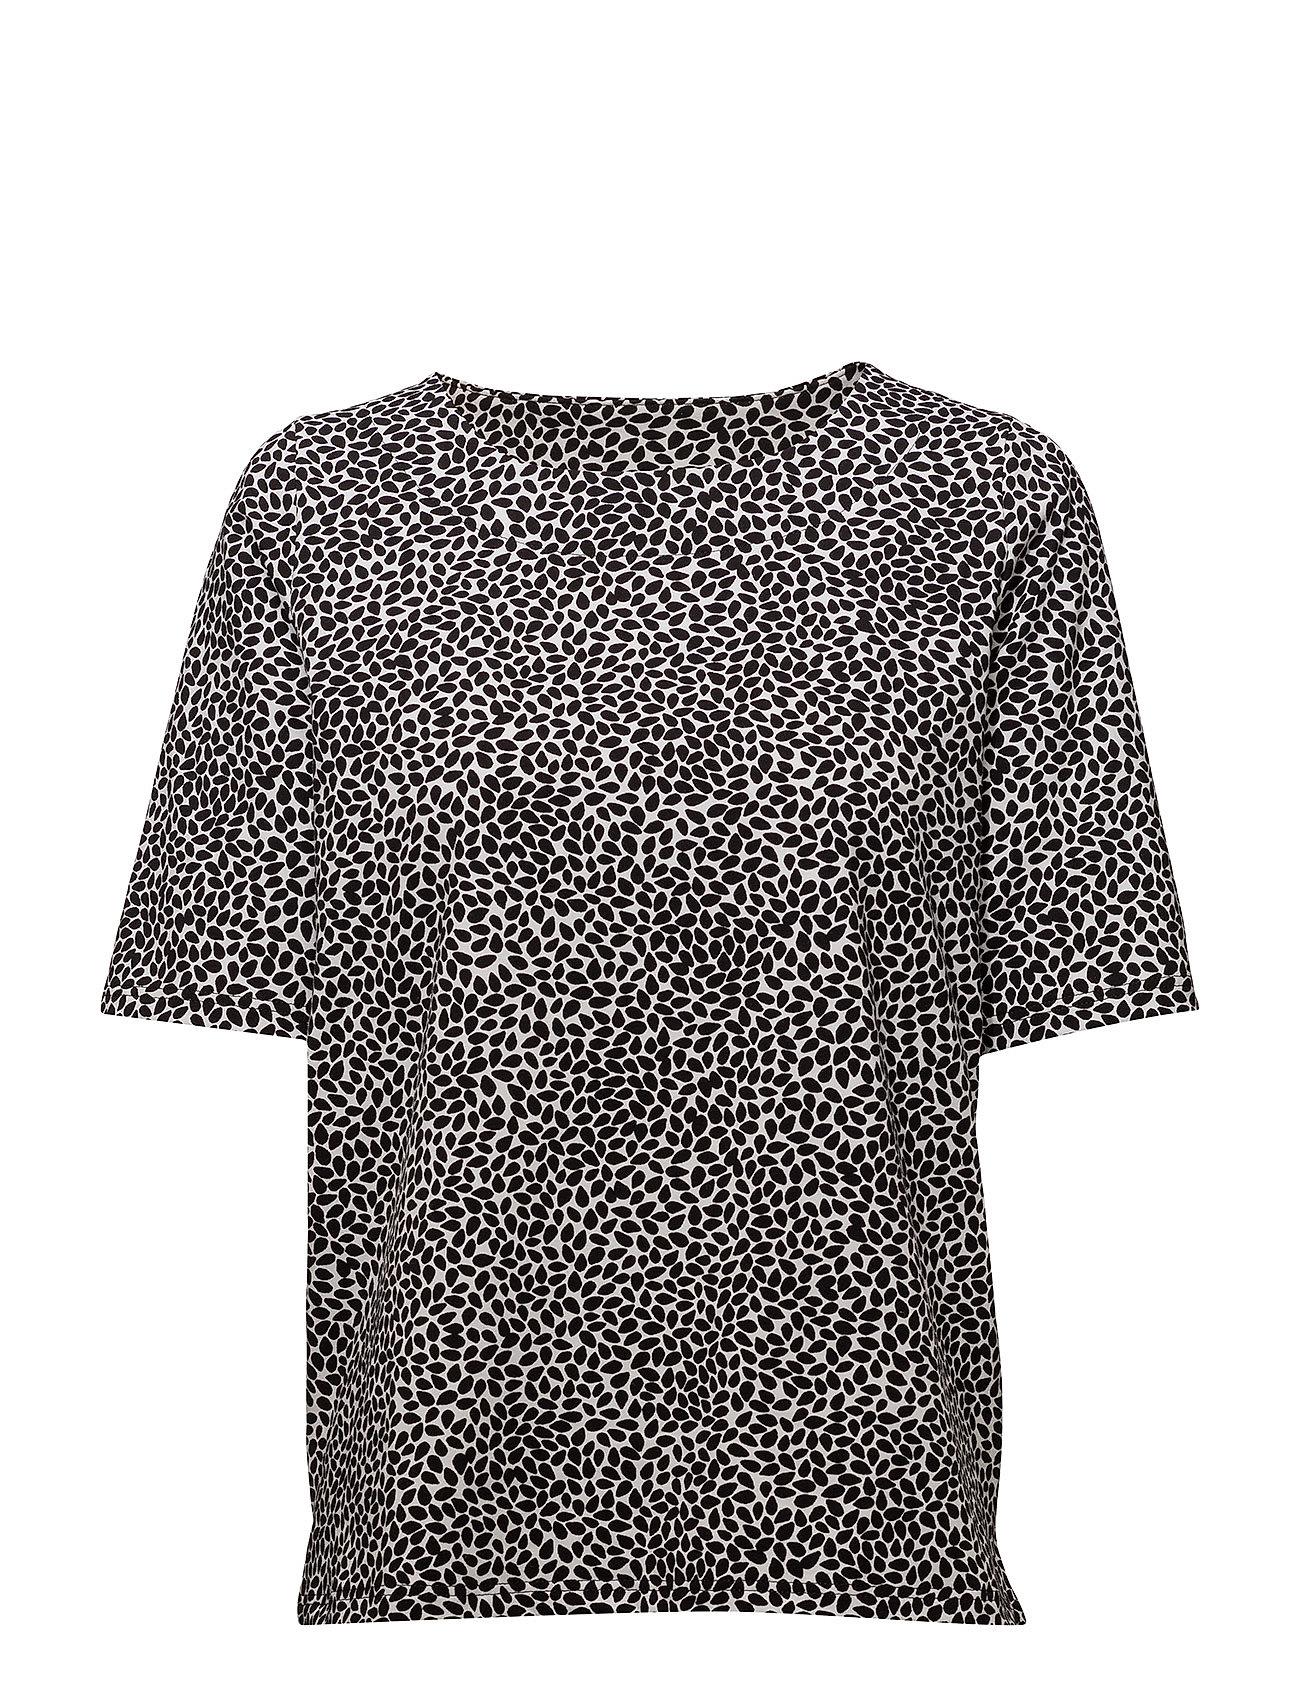 Nanso Ladies shirt, Sesam - BLACK